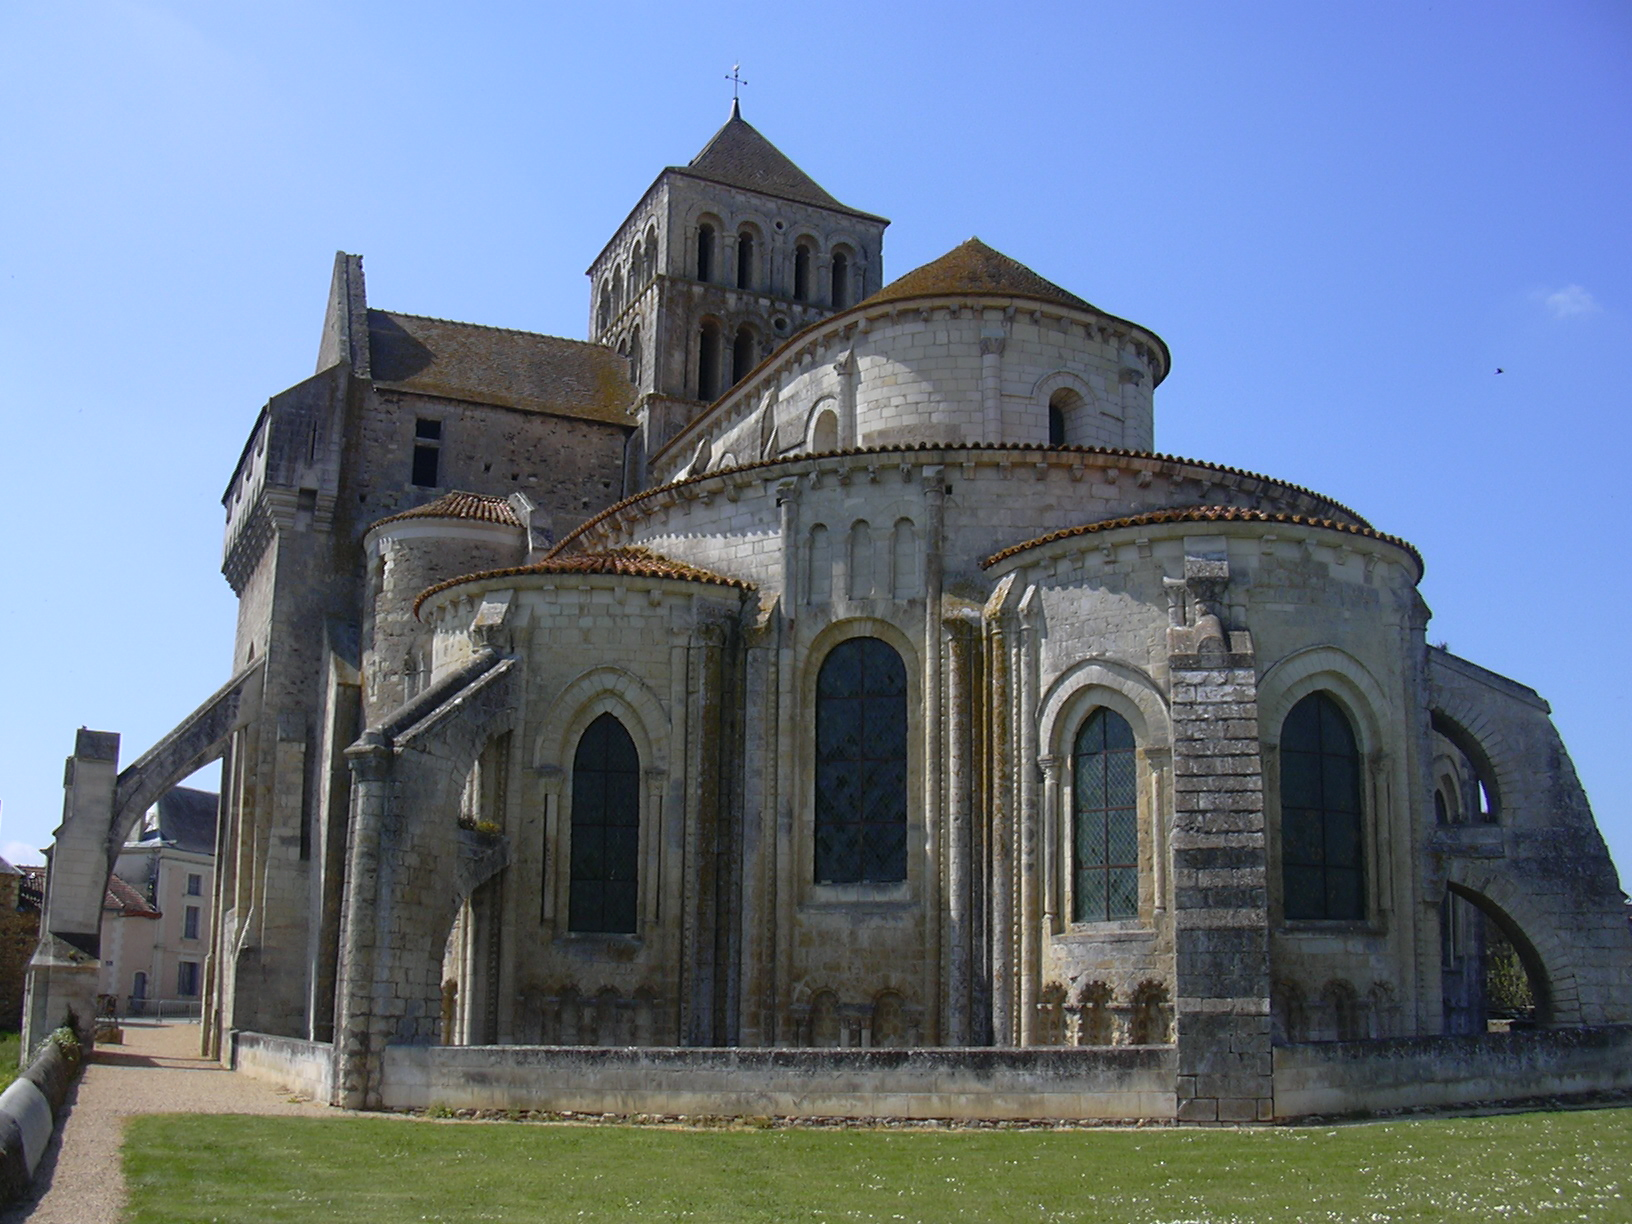 Saint-Jouin-de-Marnes